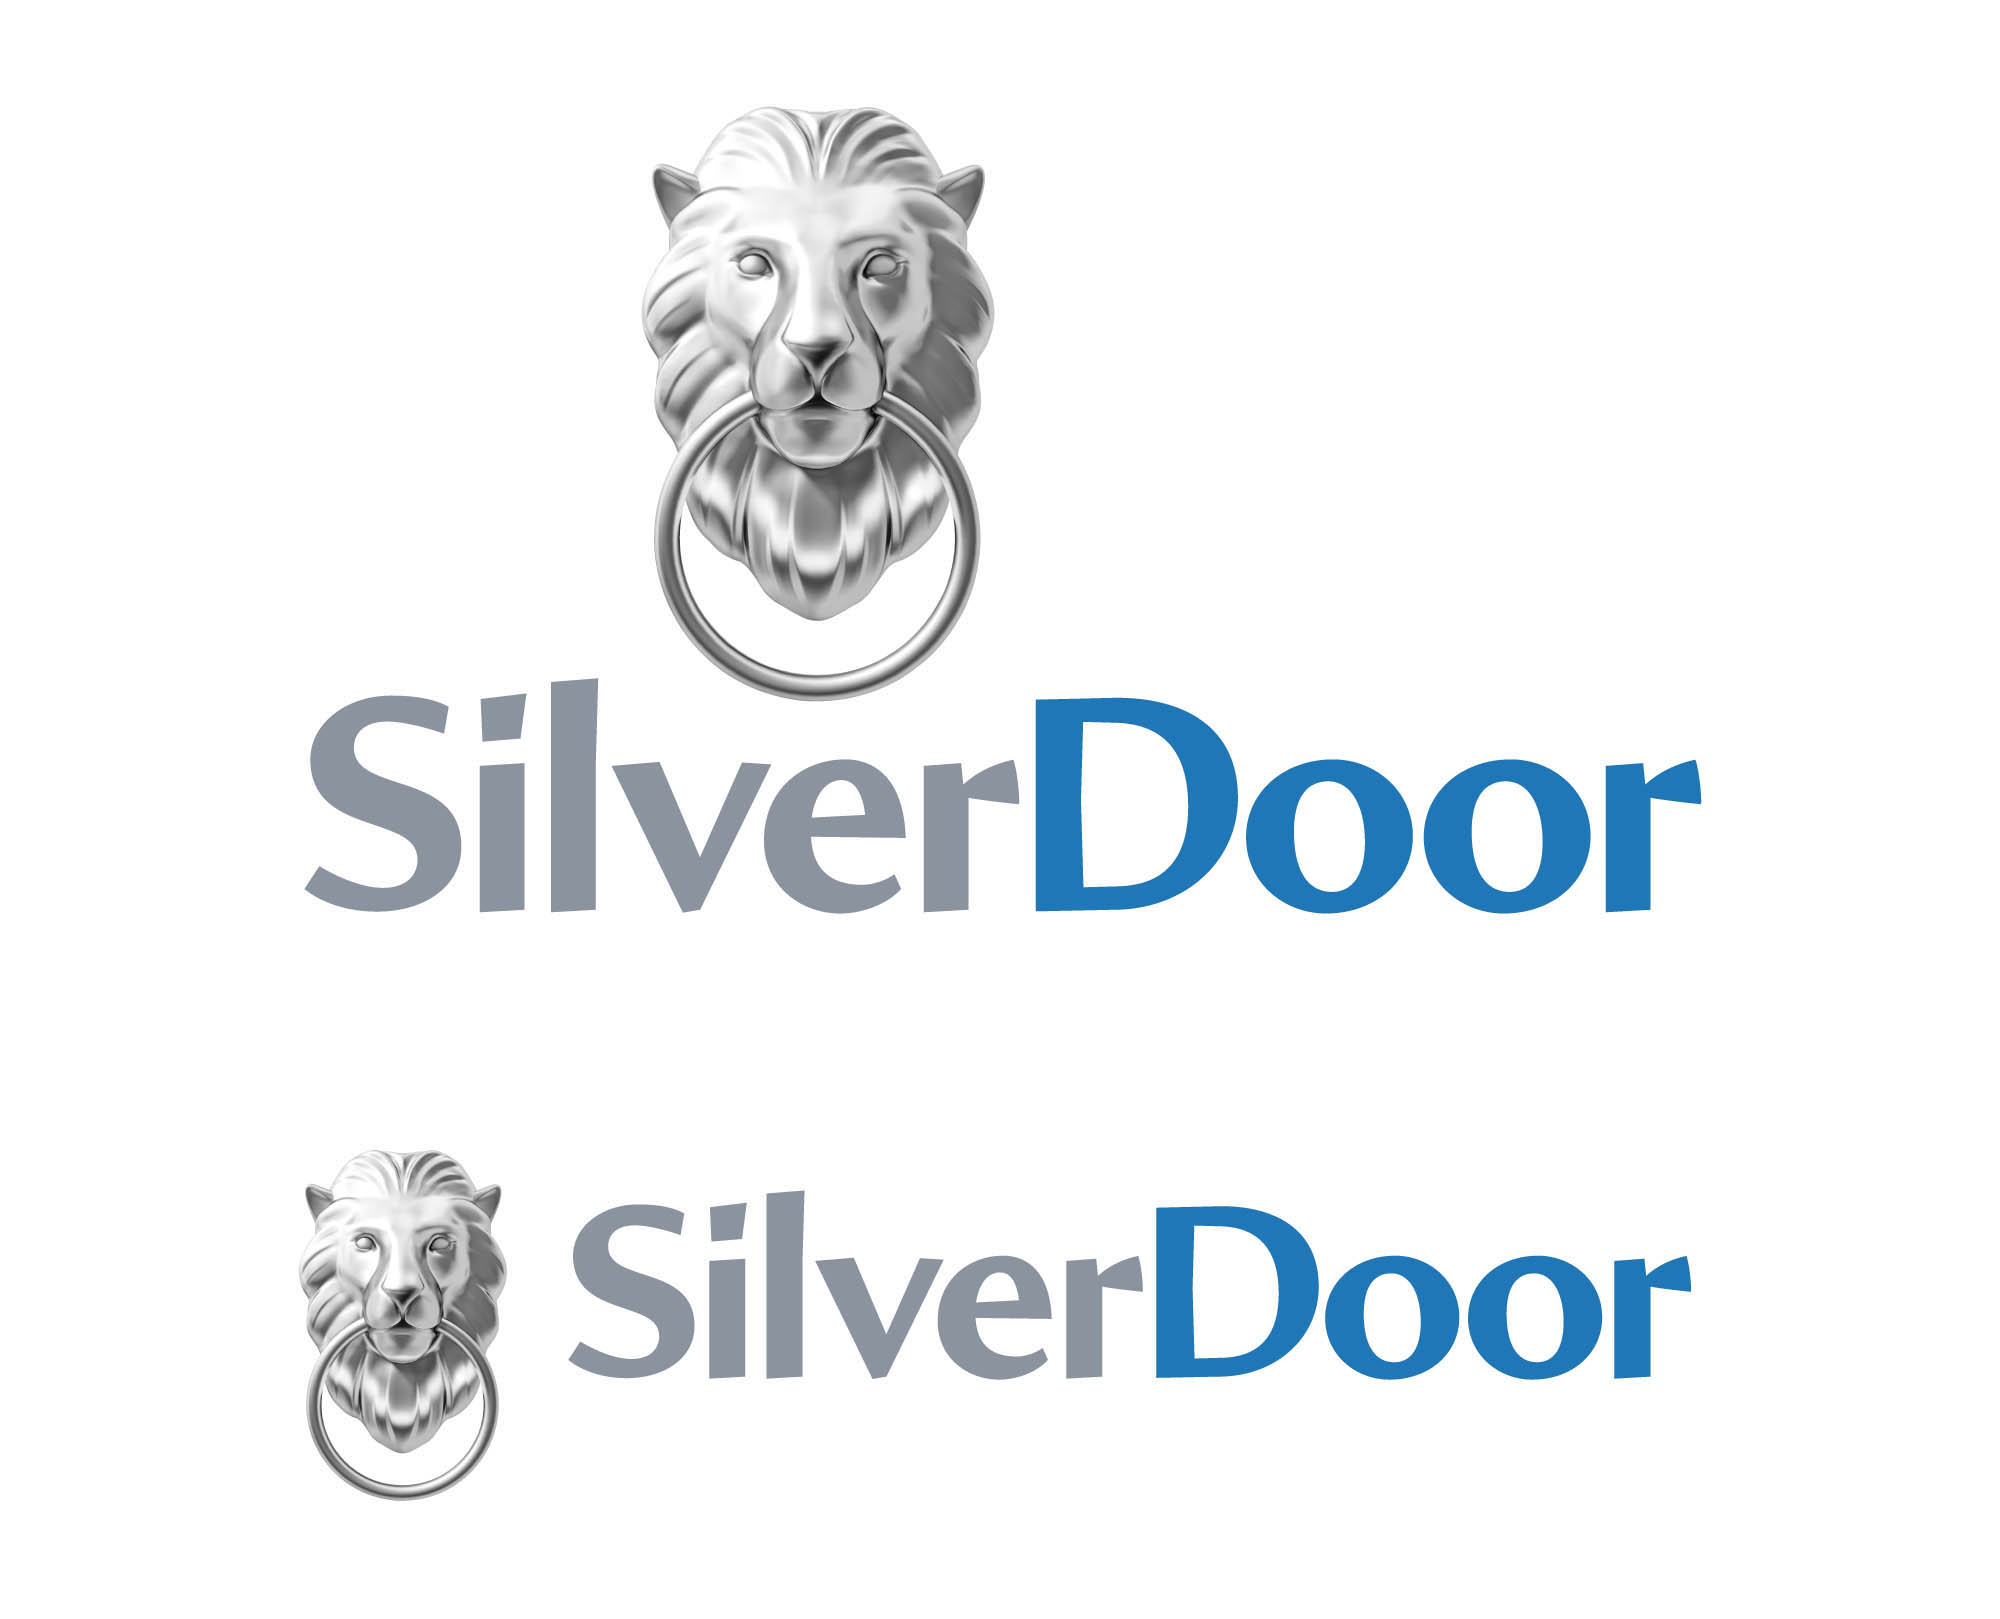 SilverDoor logo design